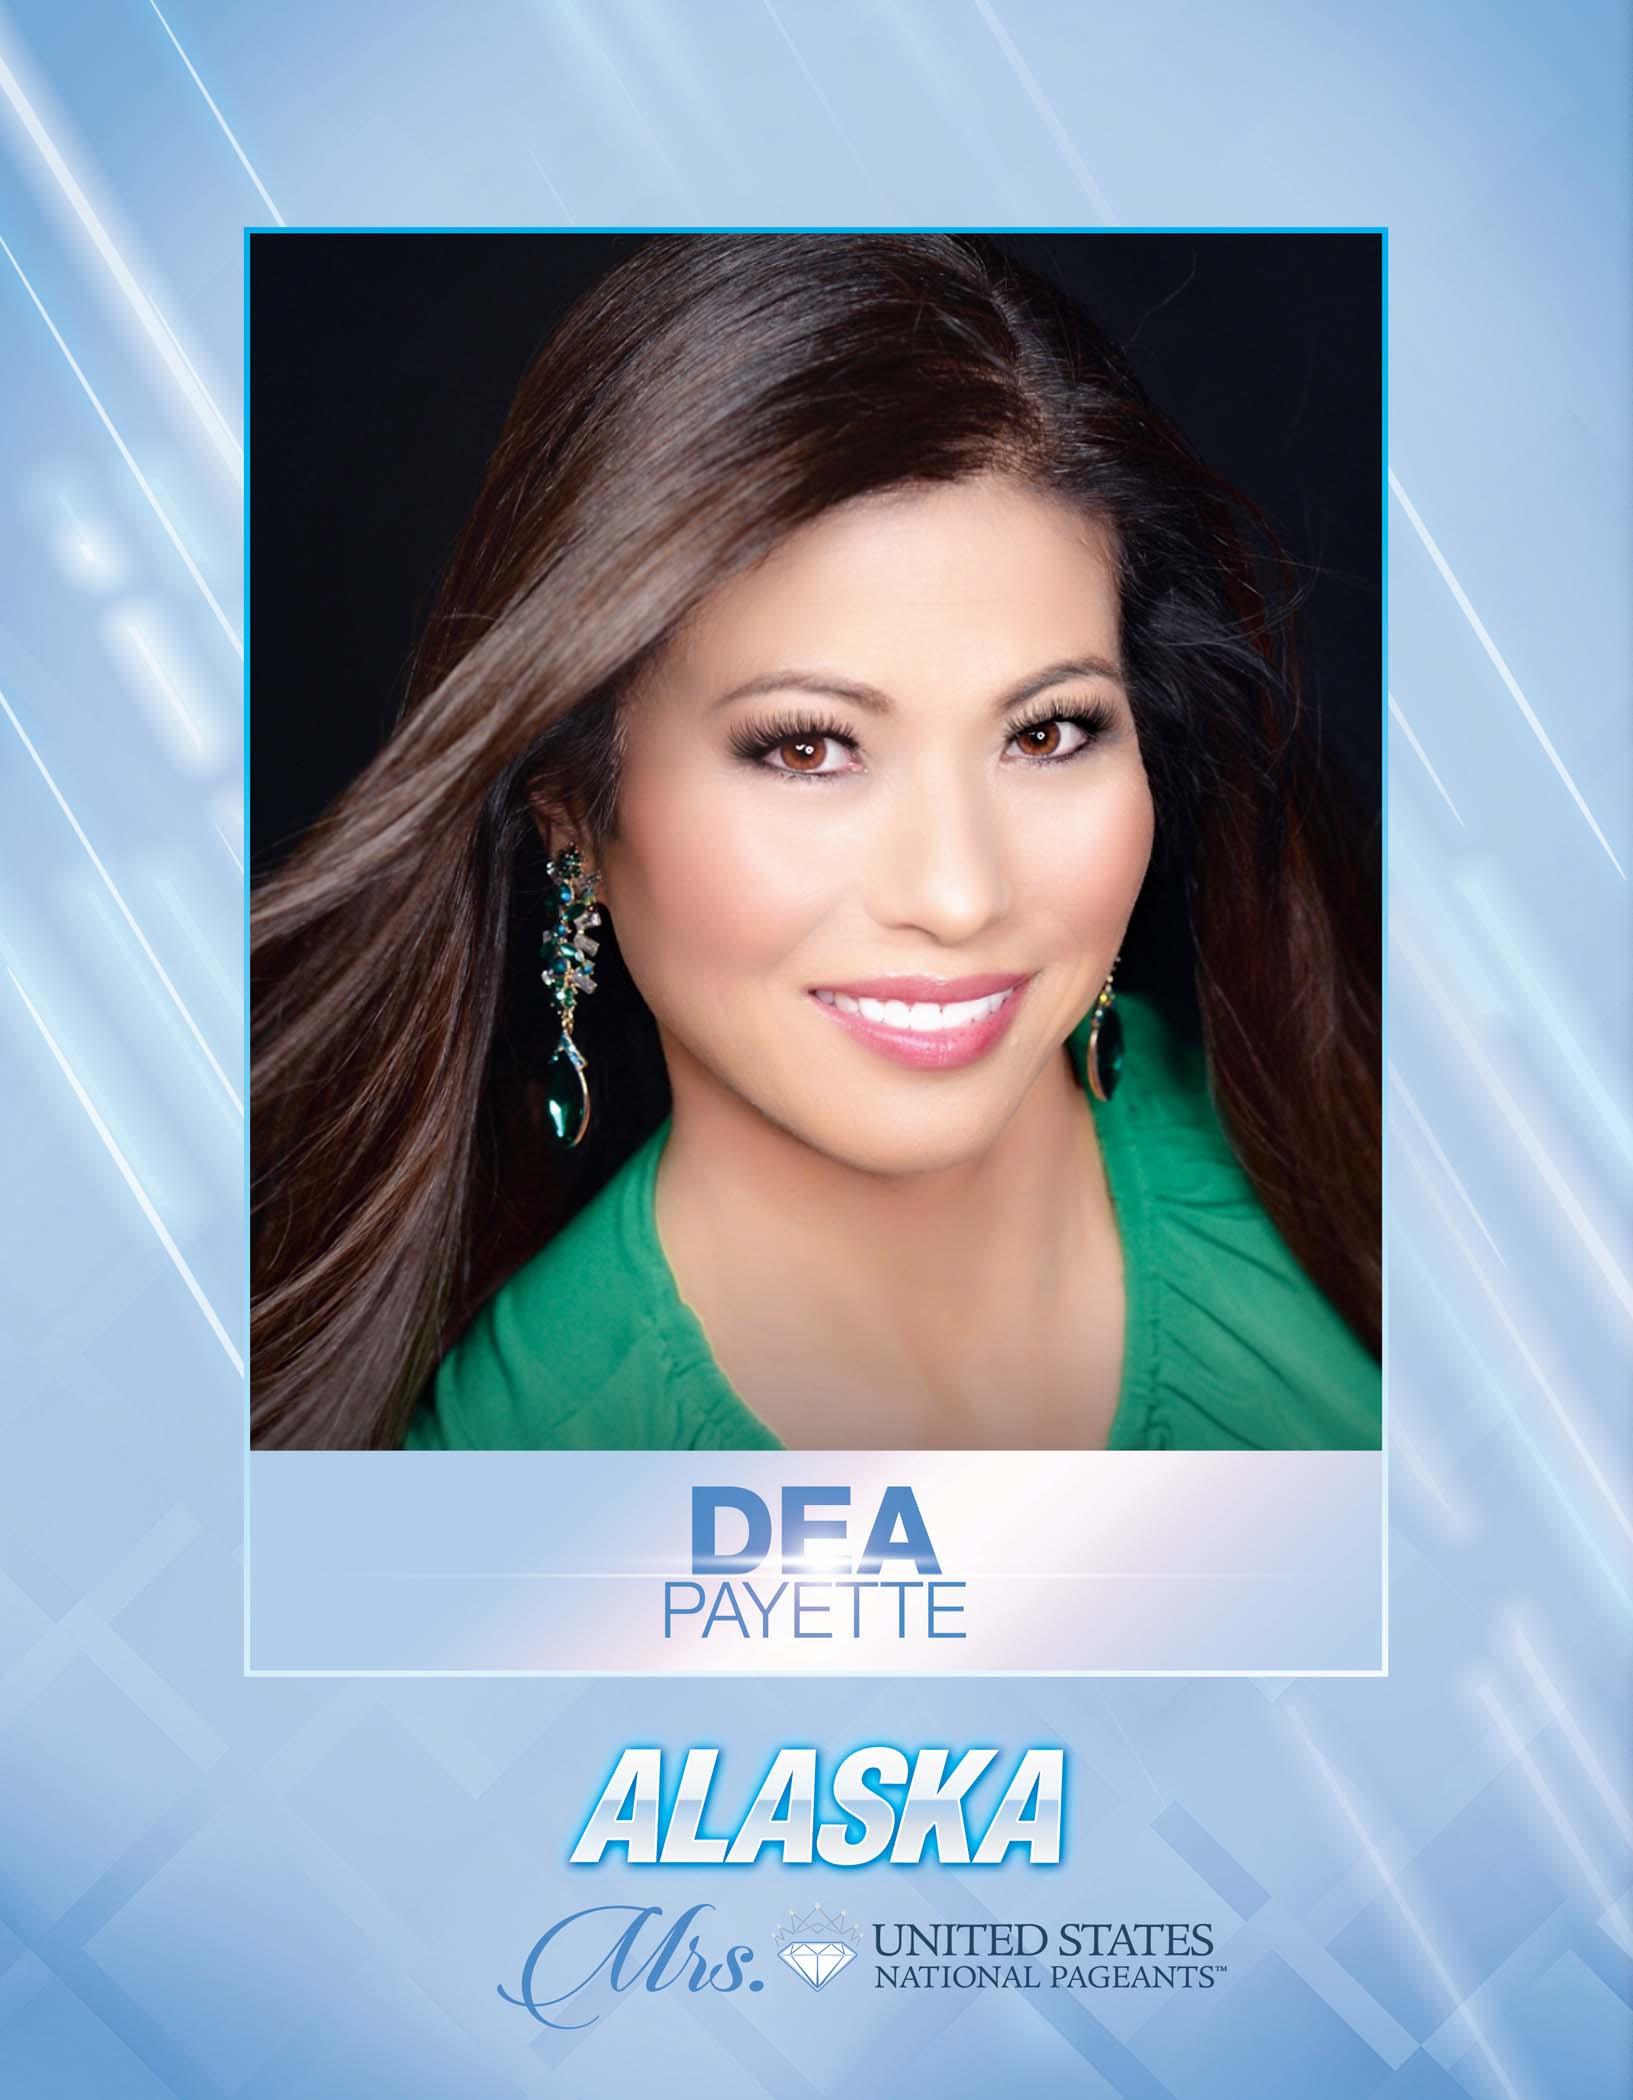 Dea Payette Mrs. Alaska United States - 2021